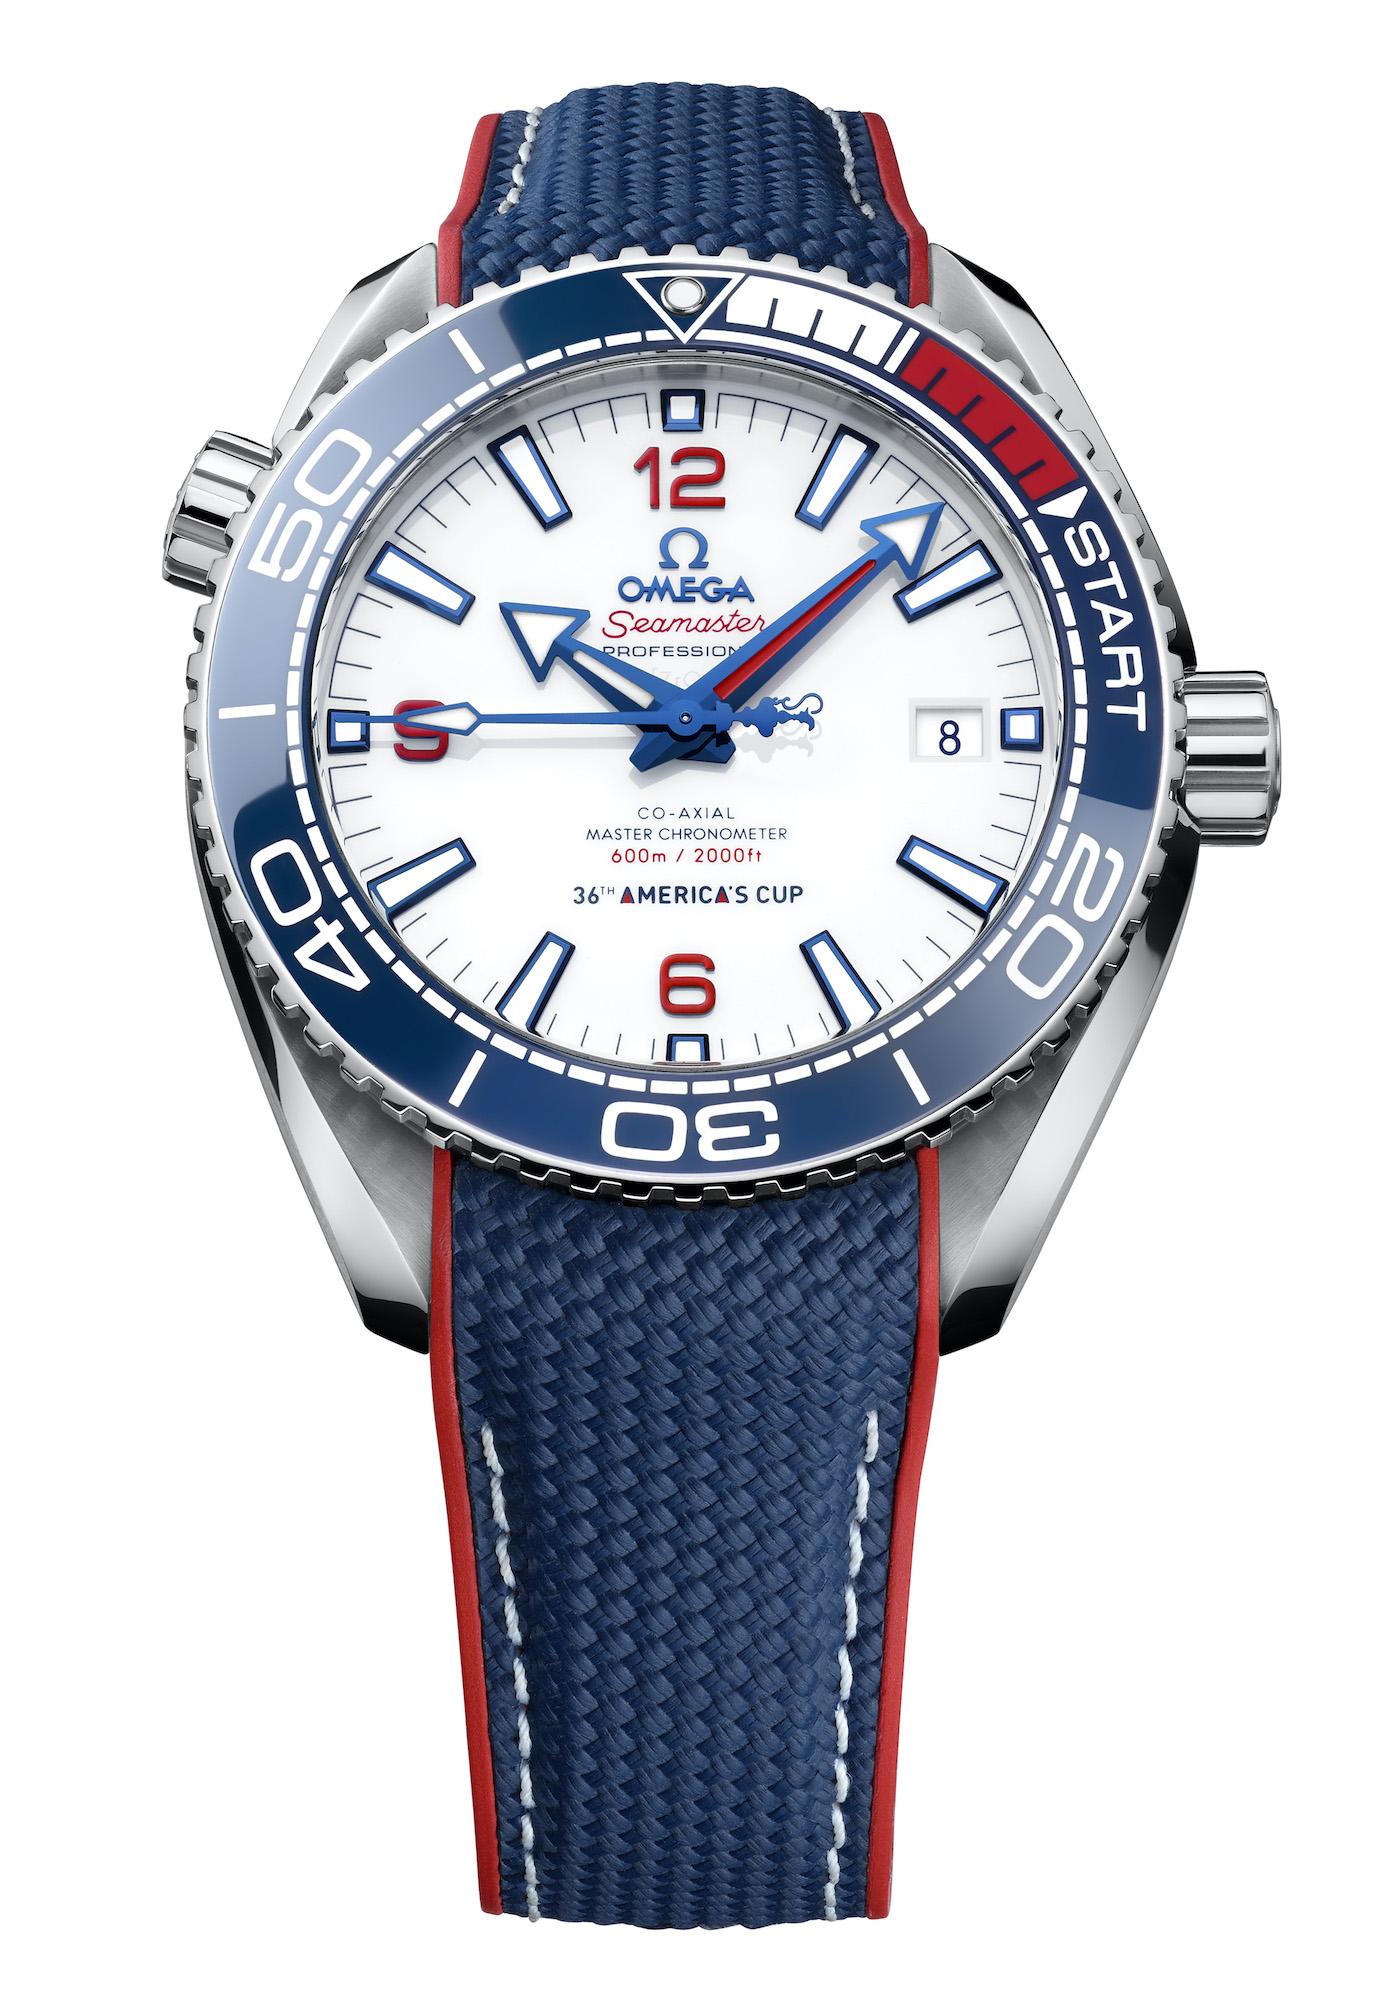 Omega Seamaster Planet Ocean 36th Americas Cup Edicion Limitada 215.32.43.21.04.001